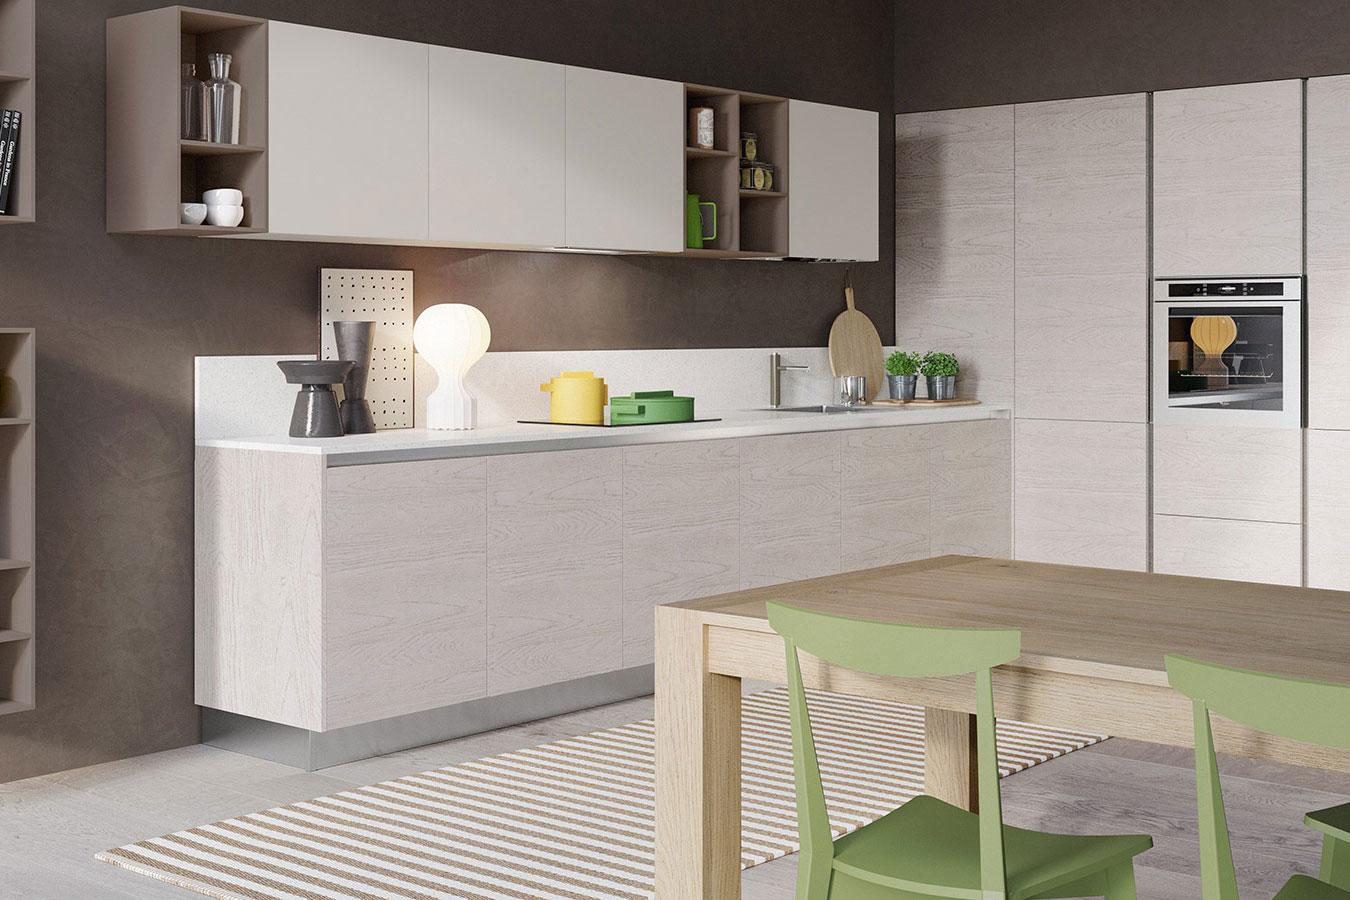 Cucina cloe di arredo3 righetti mobili novara for Cucina verona arredo 3